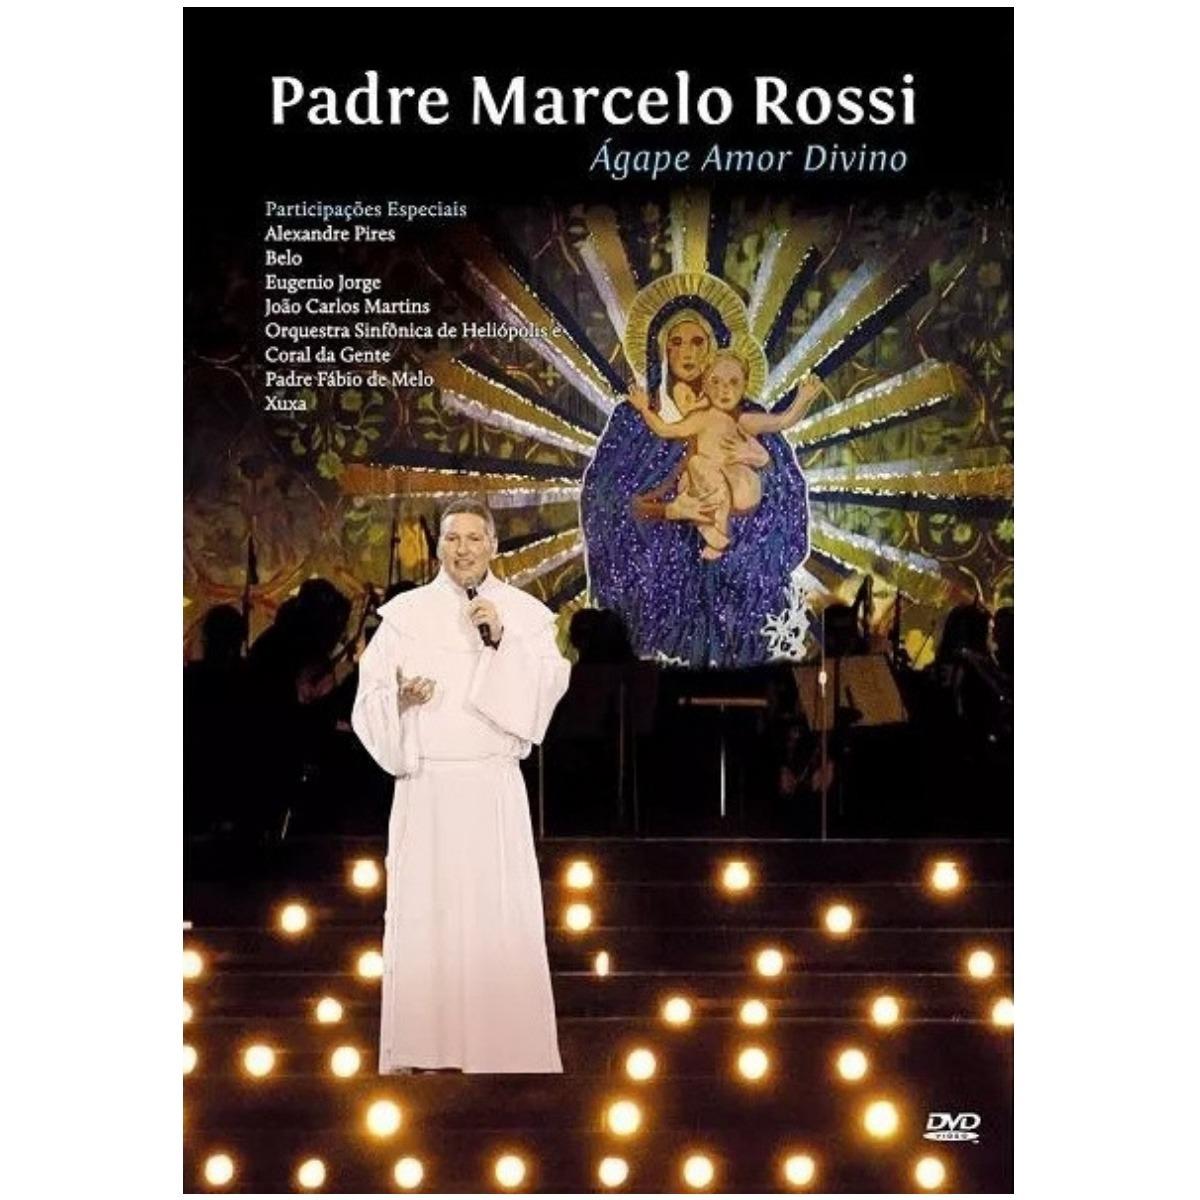 dvd padre marcelo rossi 2012 gratis